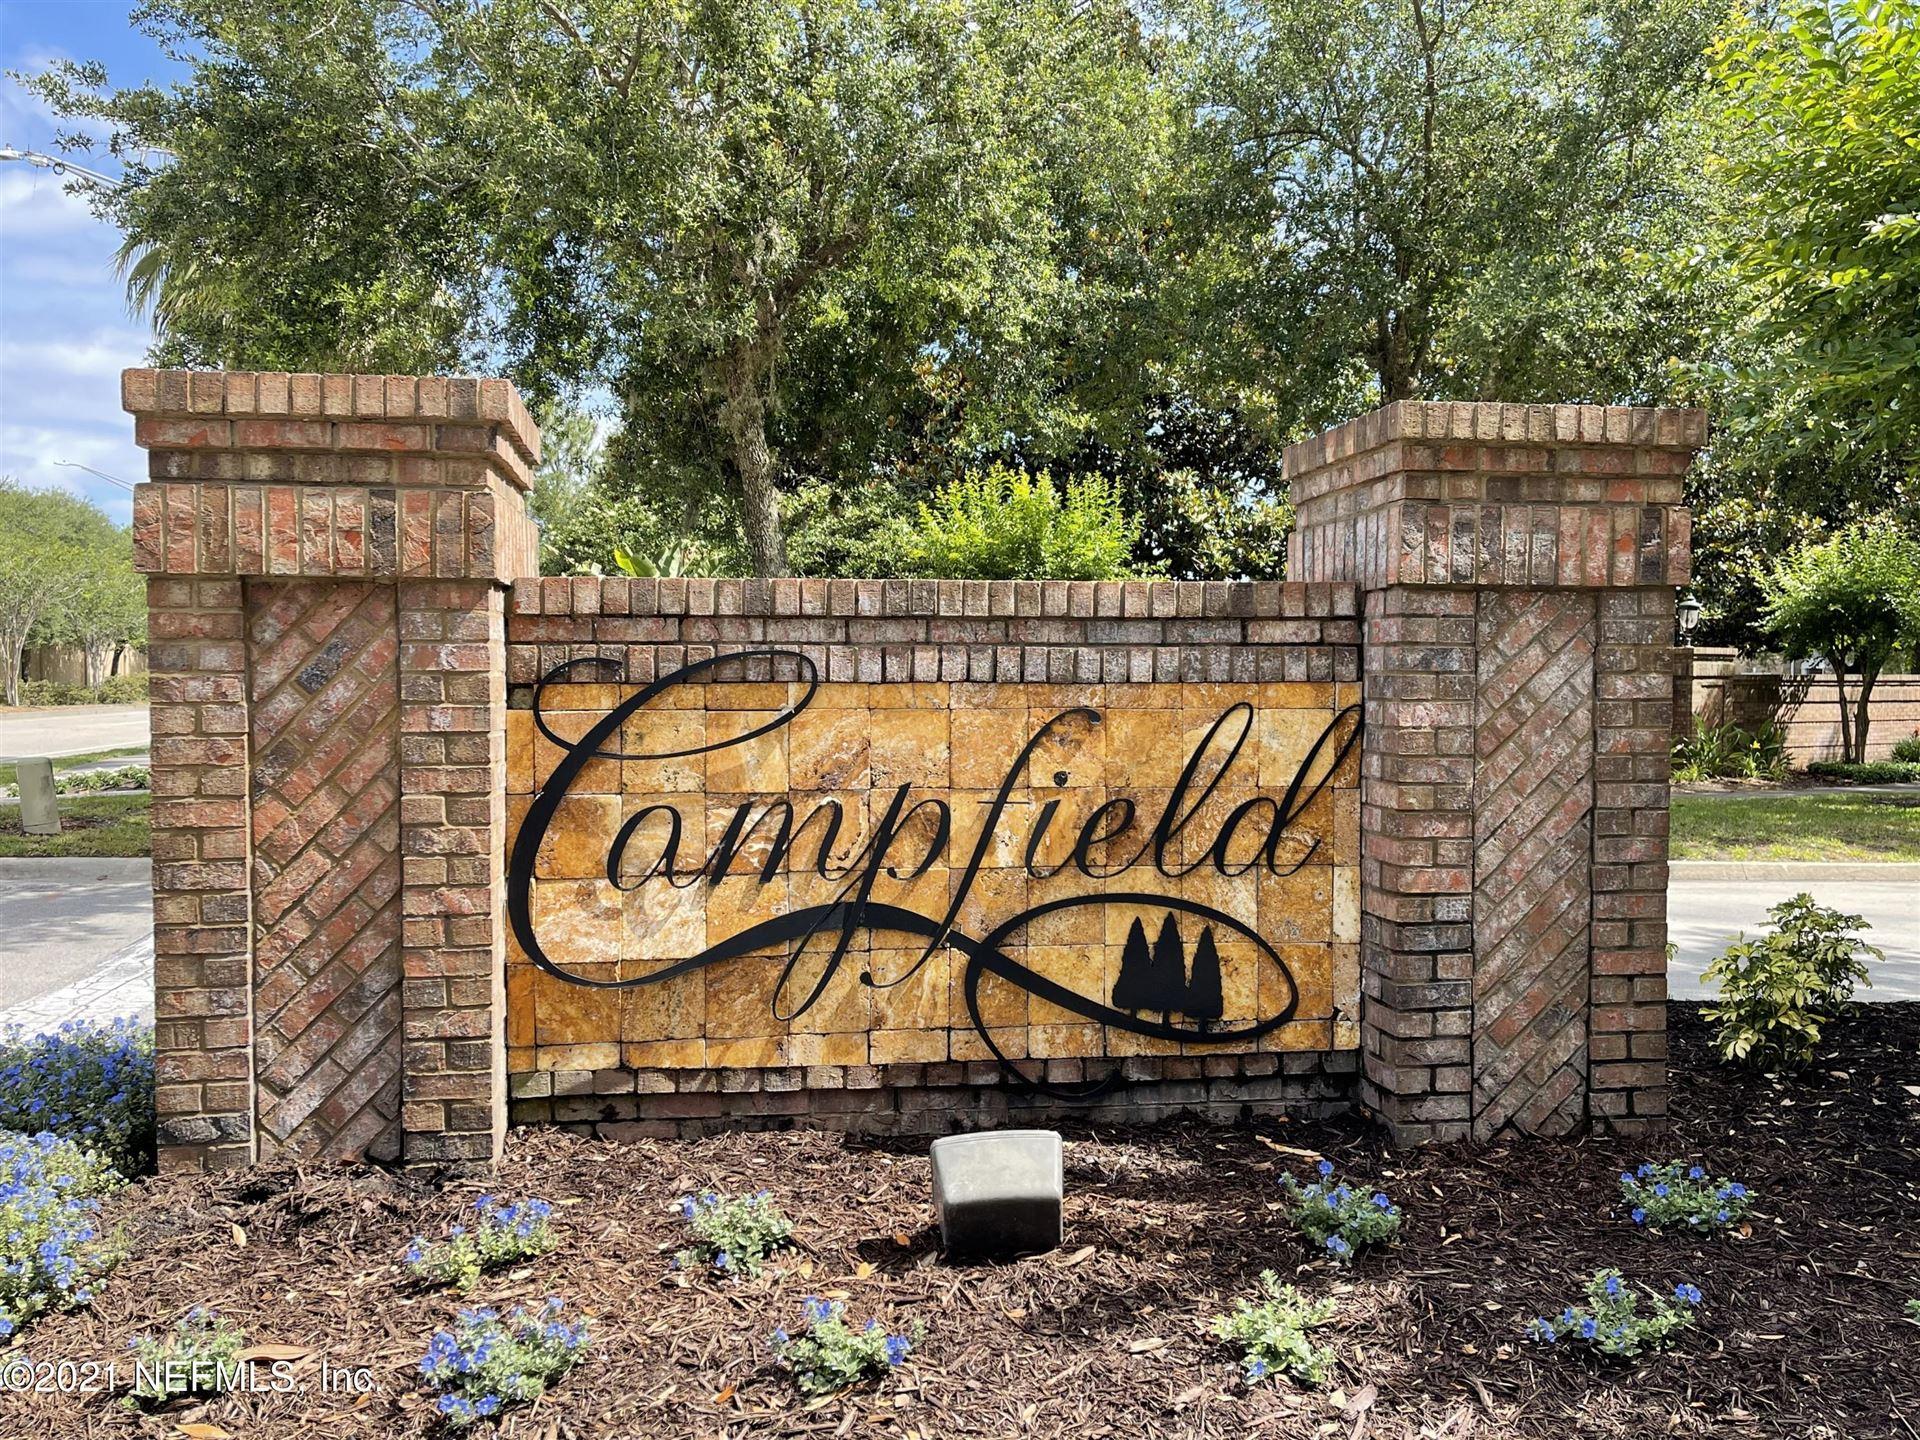 11251 CAMPFIELD DR, Jacksonville, FL 32256 - MLS#: 1112104